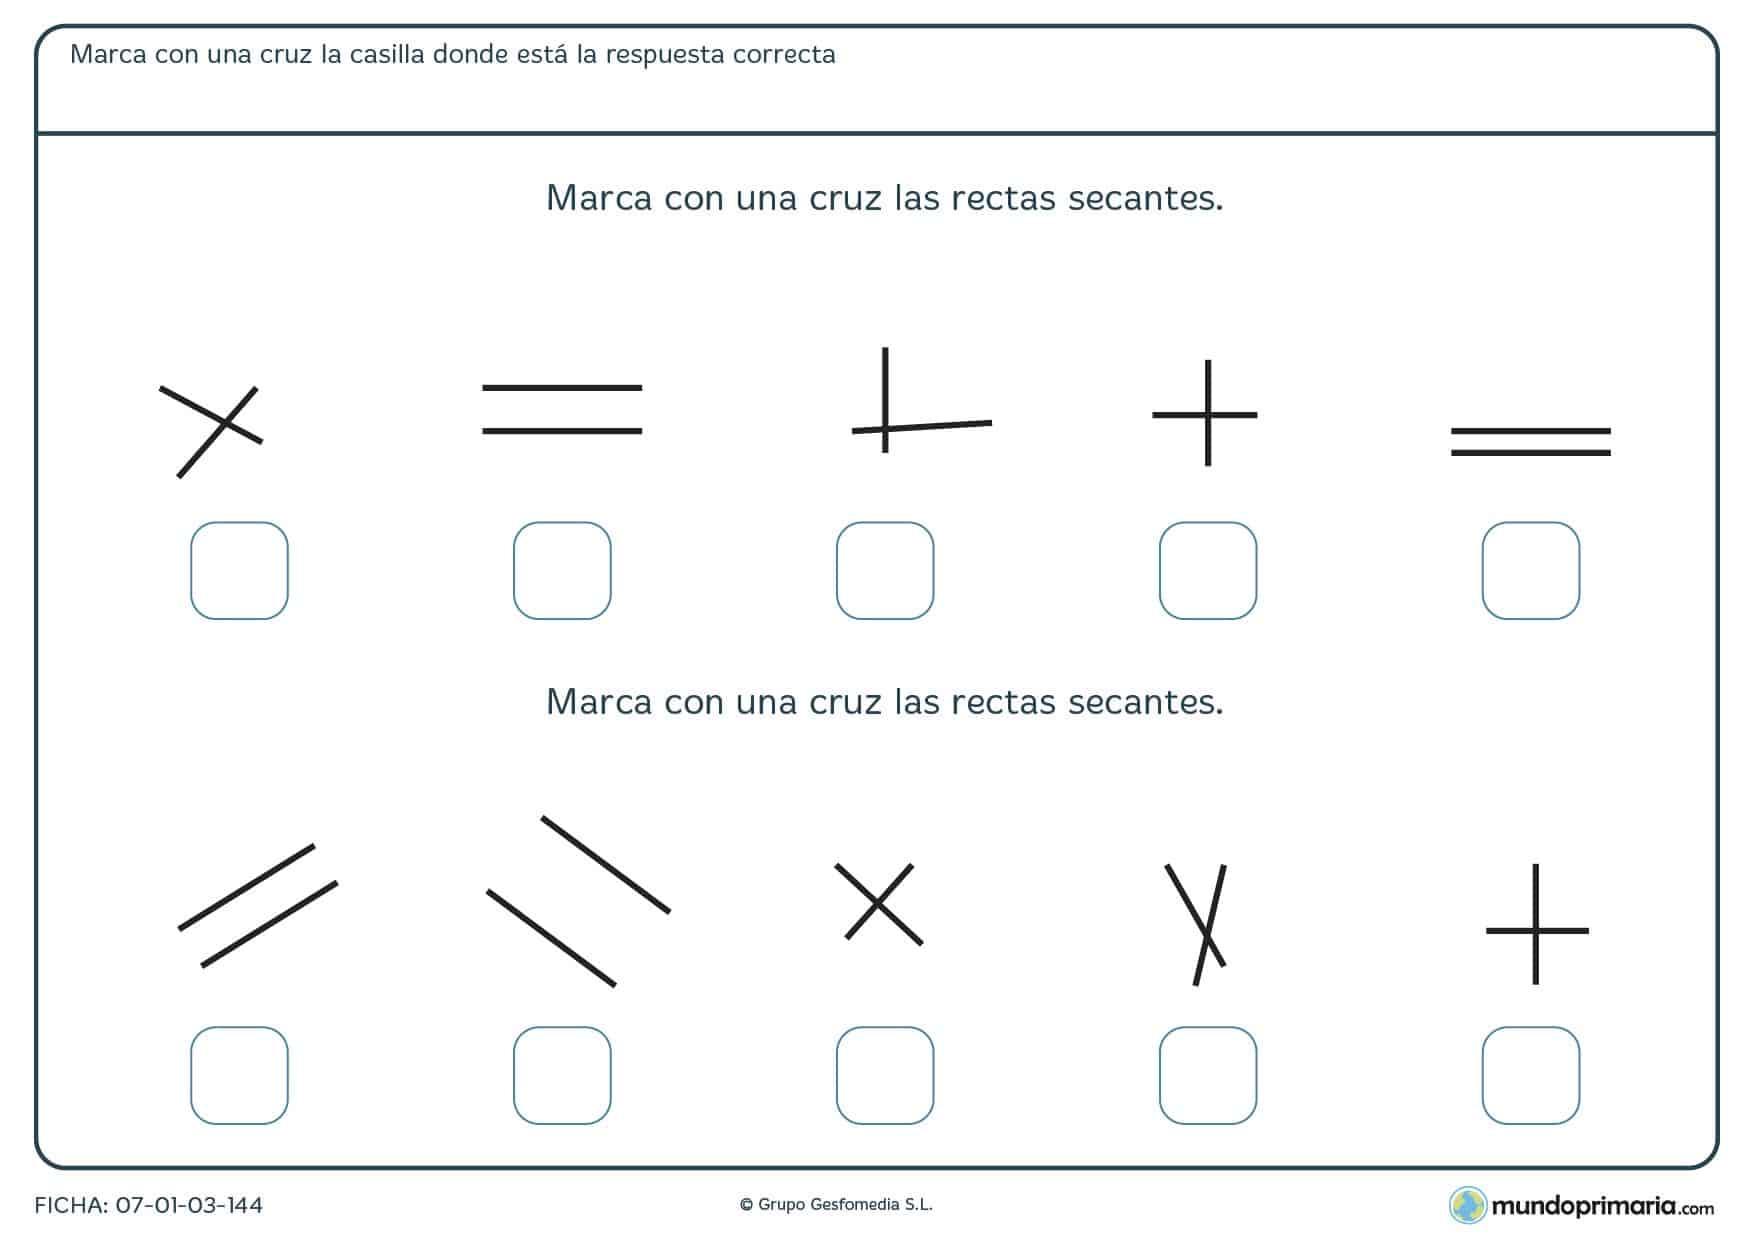 Ficha de rectas secantes con 10 tipos diferentes de pares de rectas, señala las secantes.